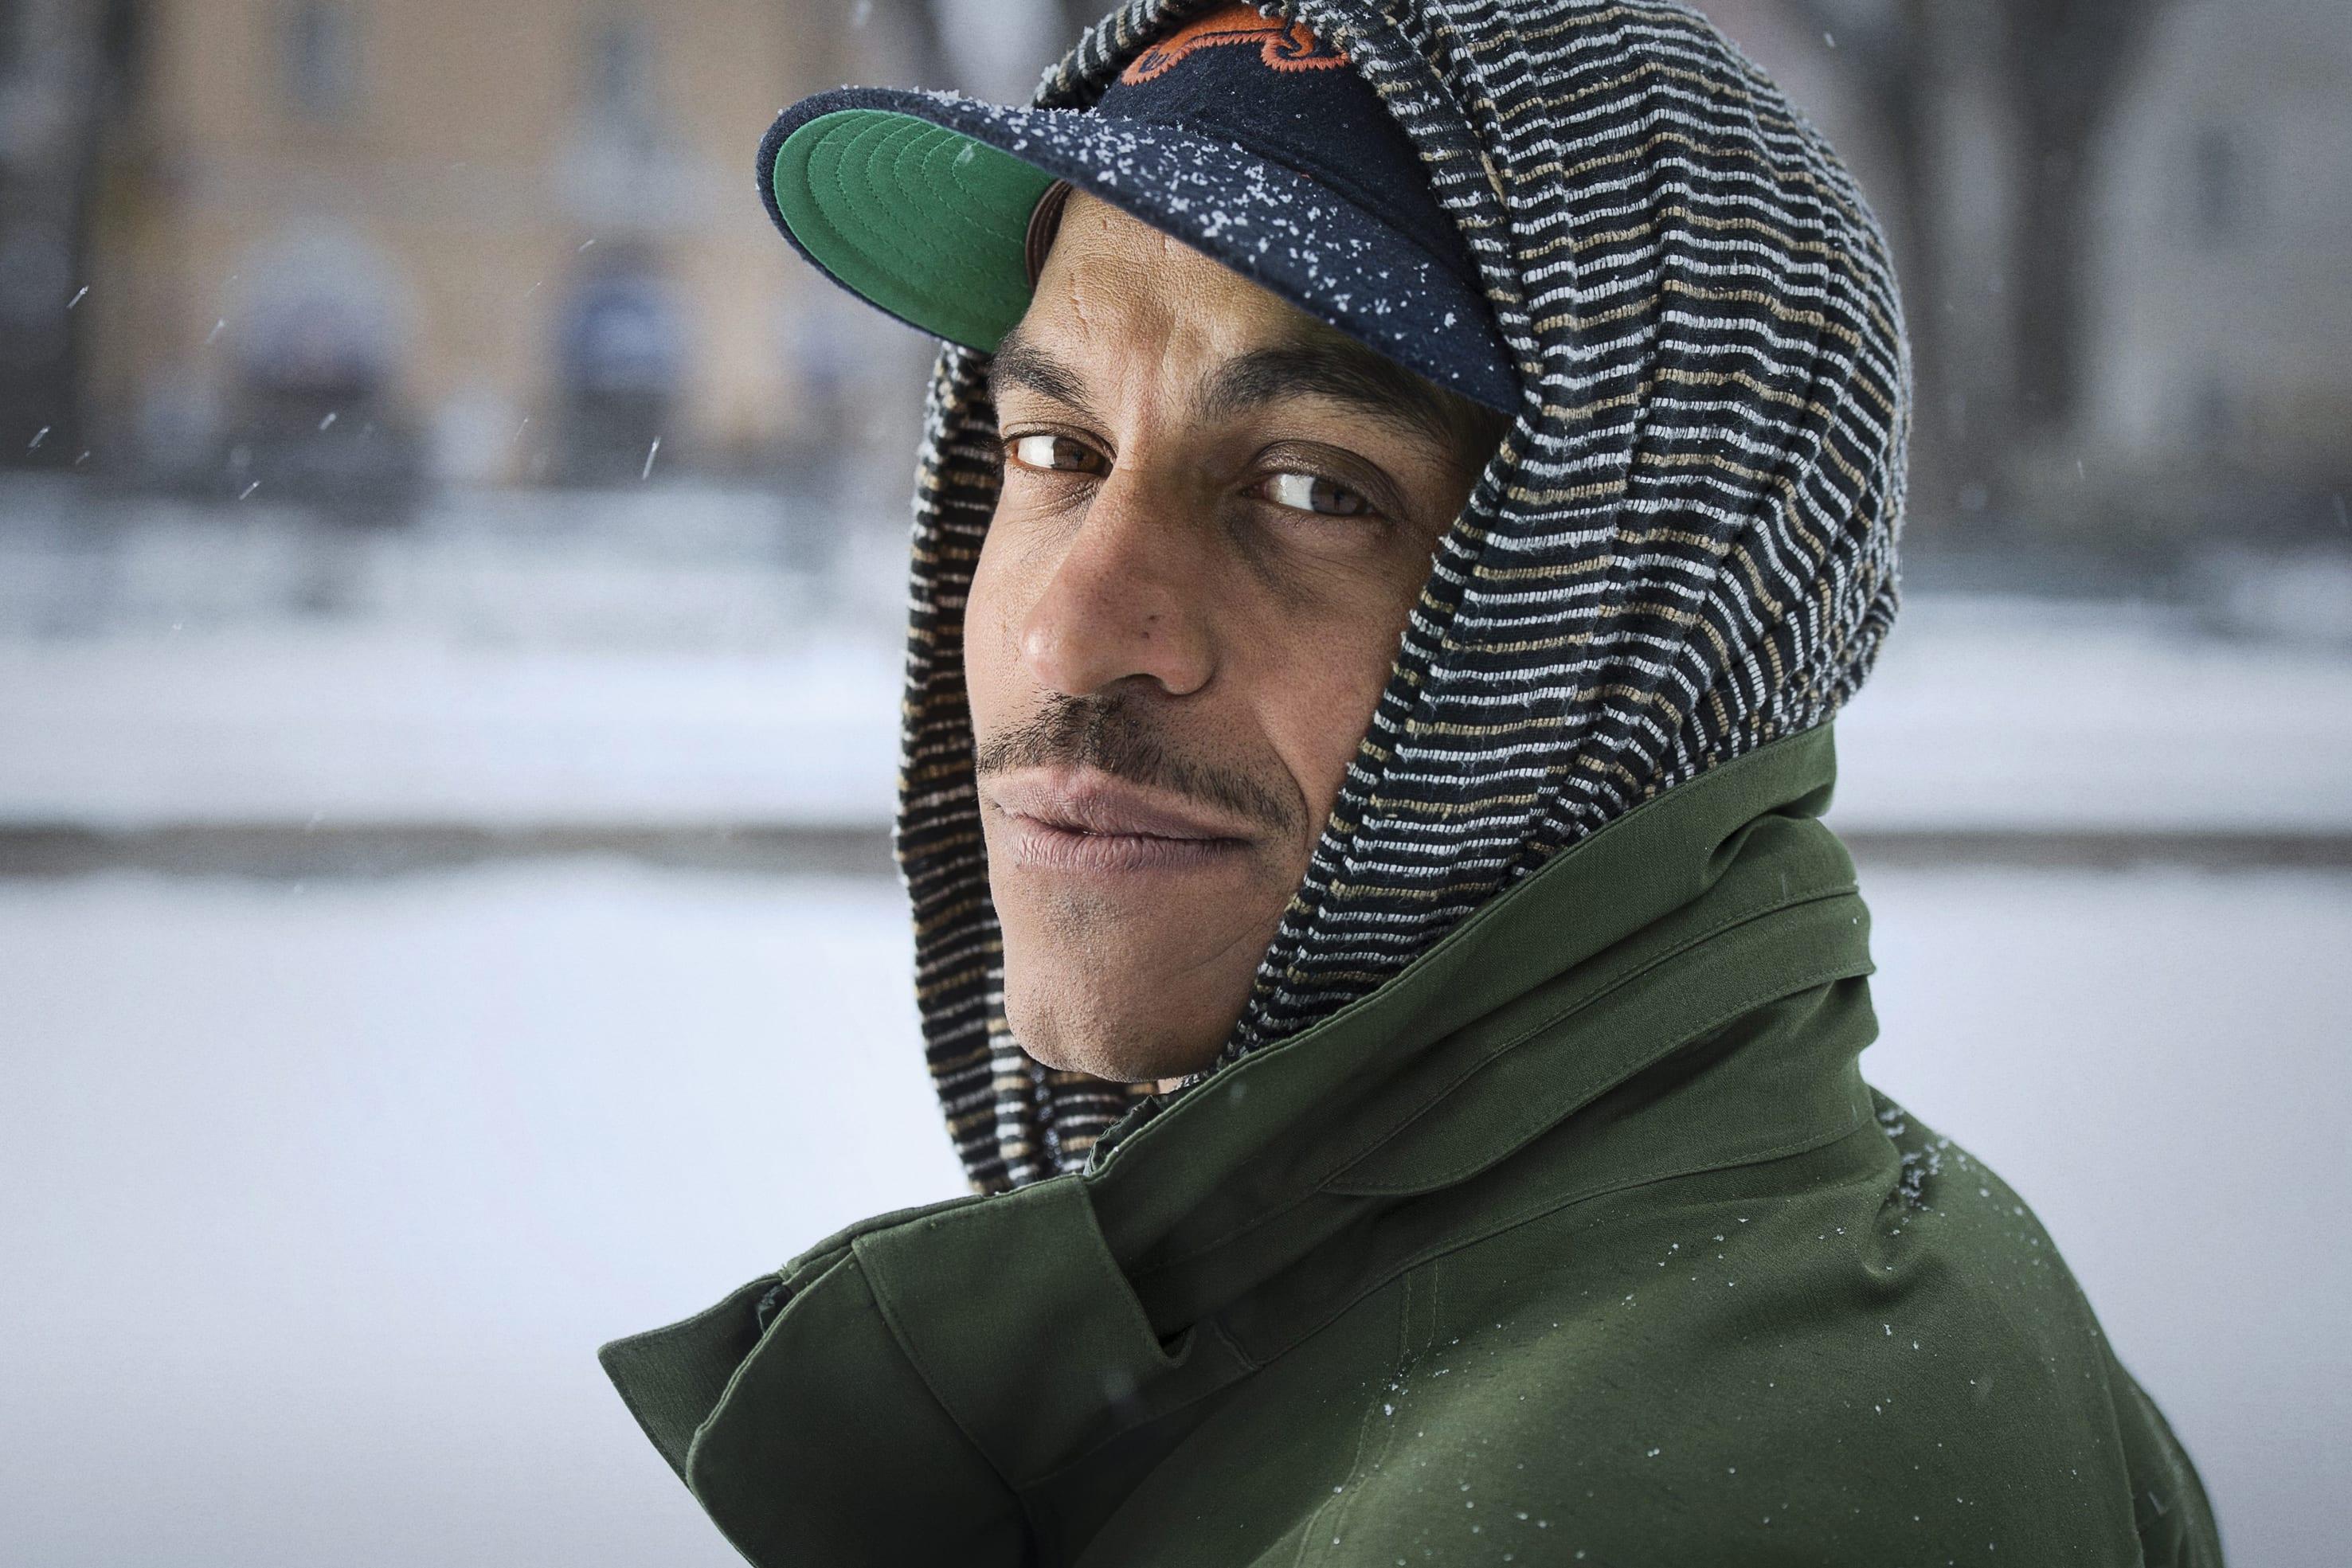 "Jason DiakitÈ ""Timbuktu"" ‰r aktuell med ny bok om sin egen familj. 2016-11-08 (c) JOHANSSON CHRISTIAN  / Aftonbladet / IBL Bildbyr * * * EXPRESSEN OUT * * *  AFTONBLADET / 85764"